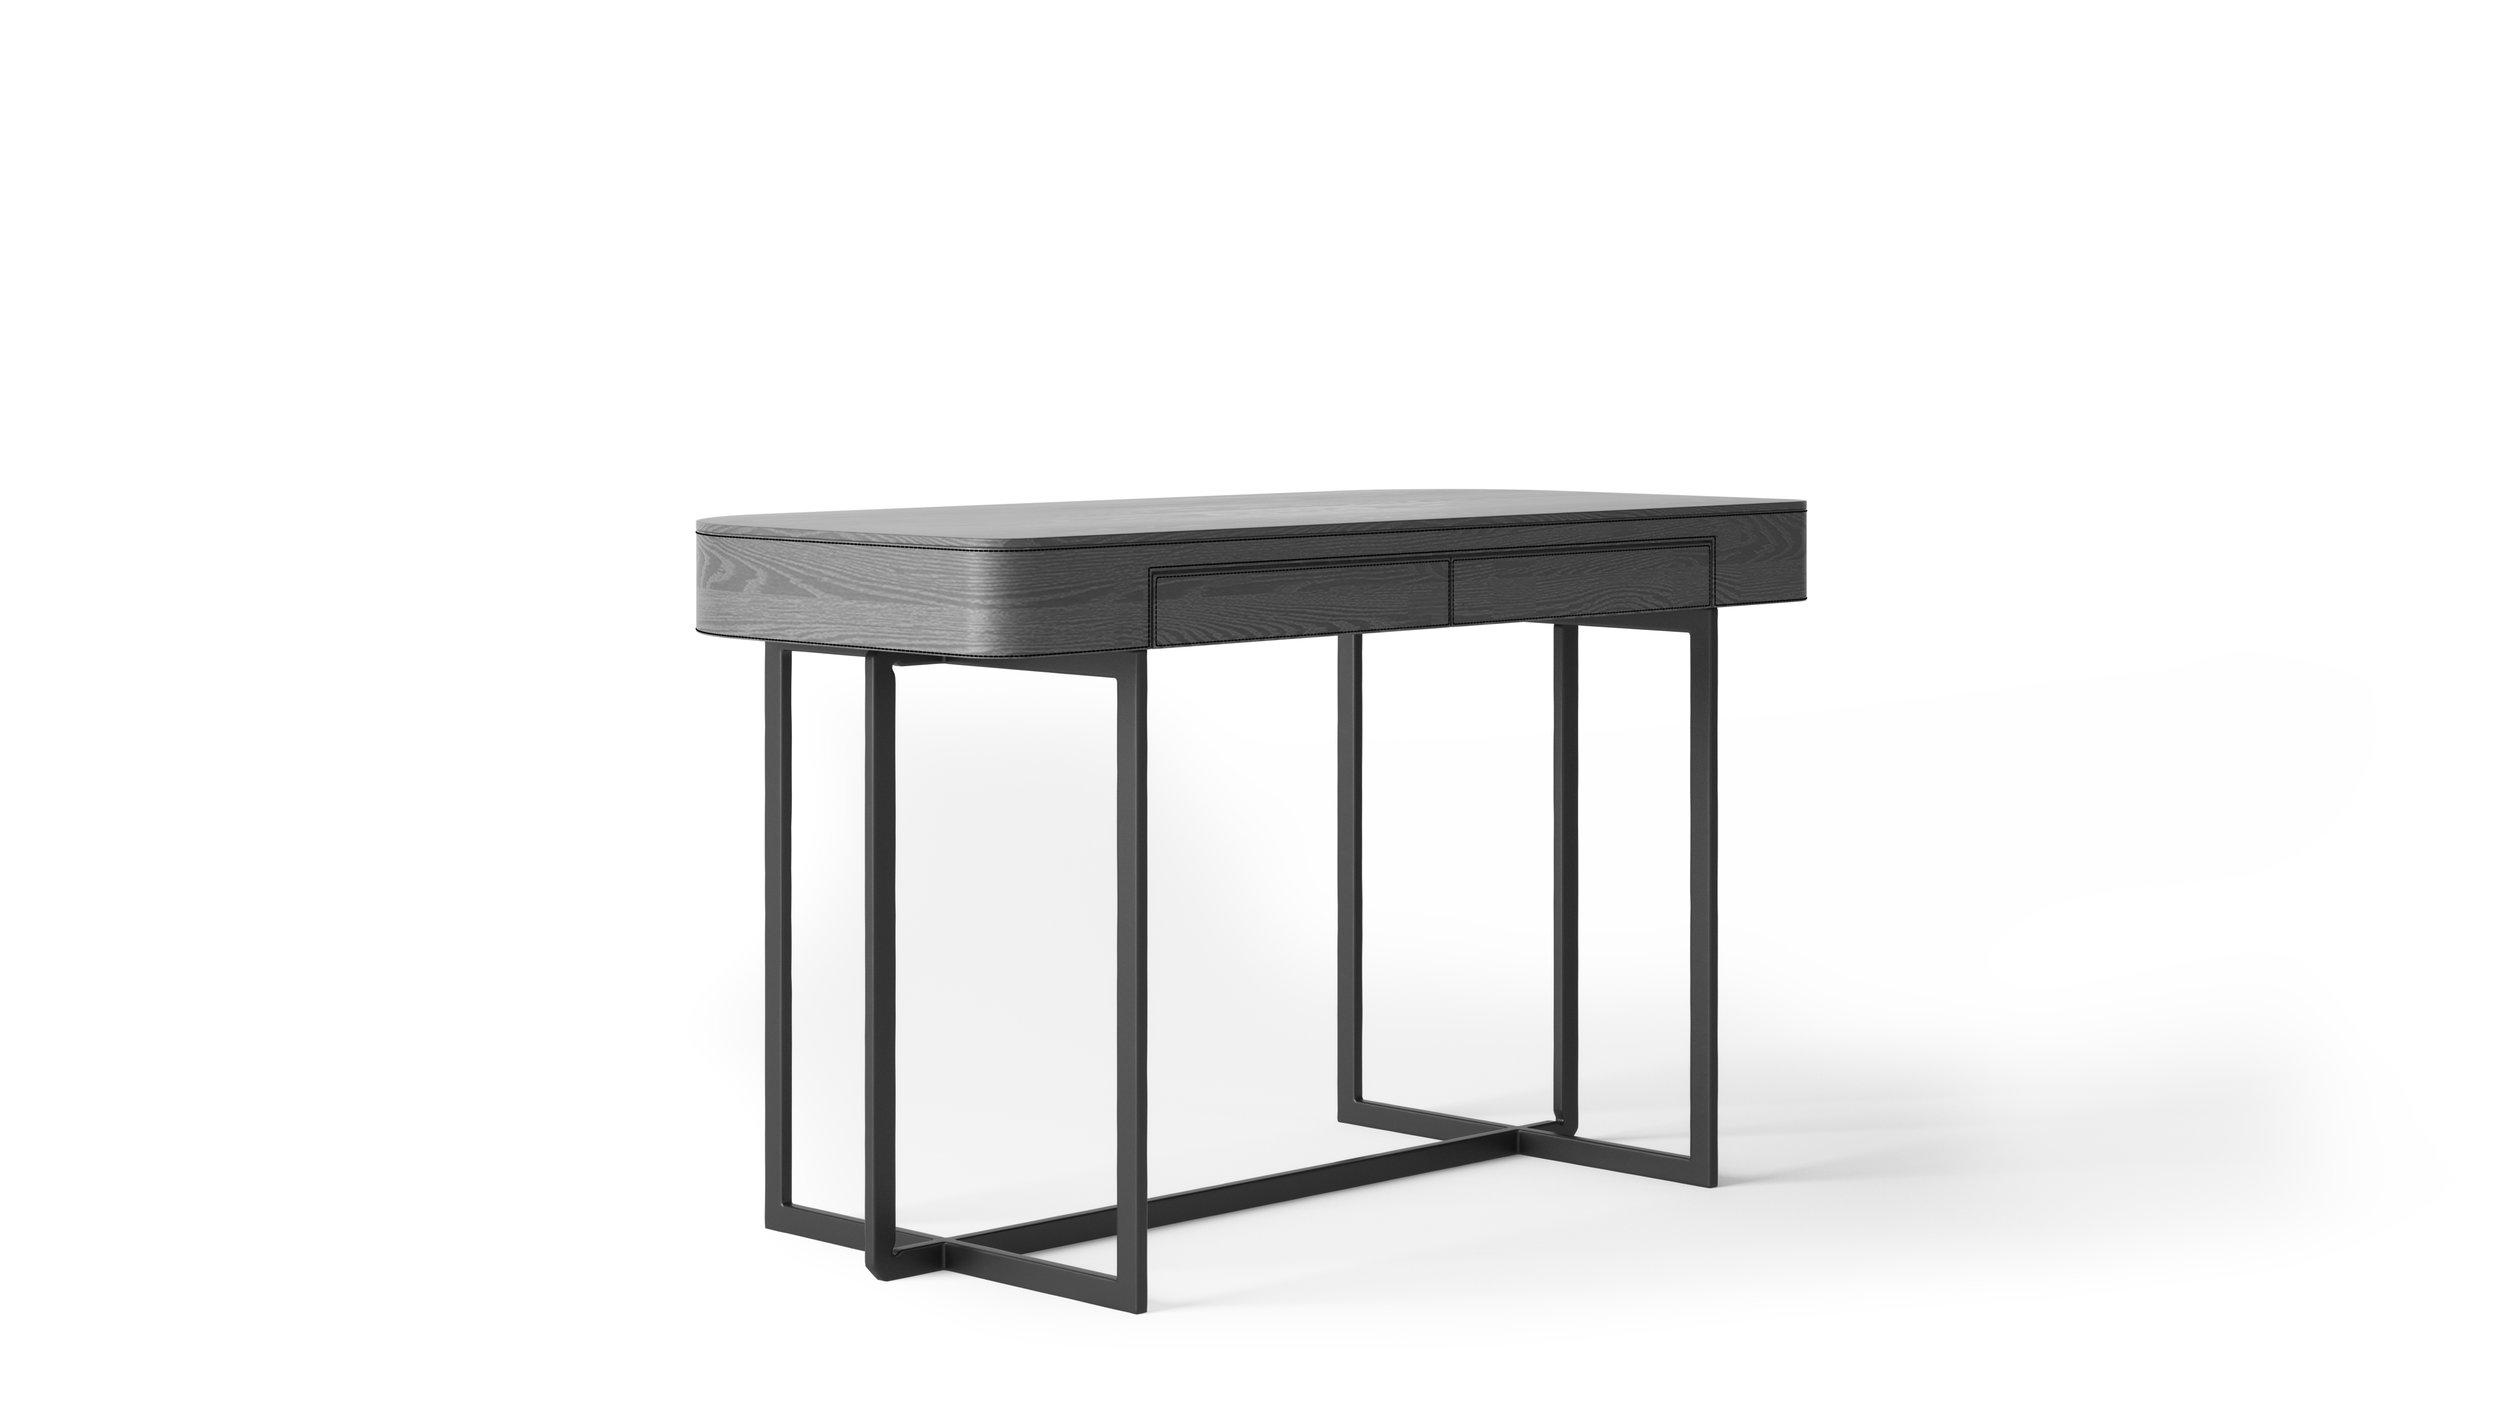 Furniture Model, Lounge Style Desk